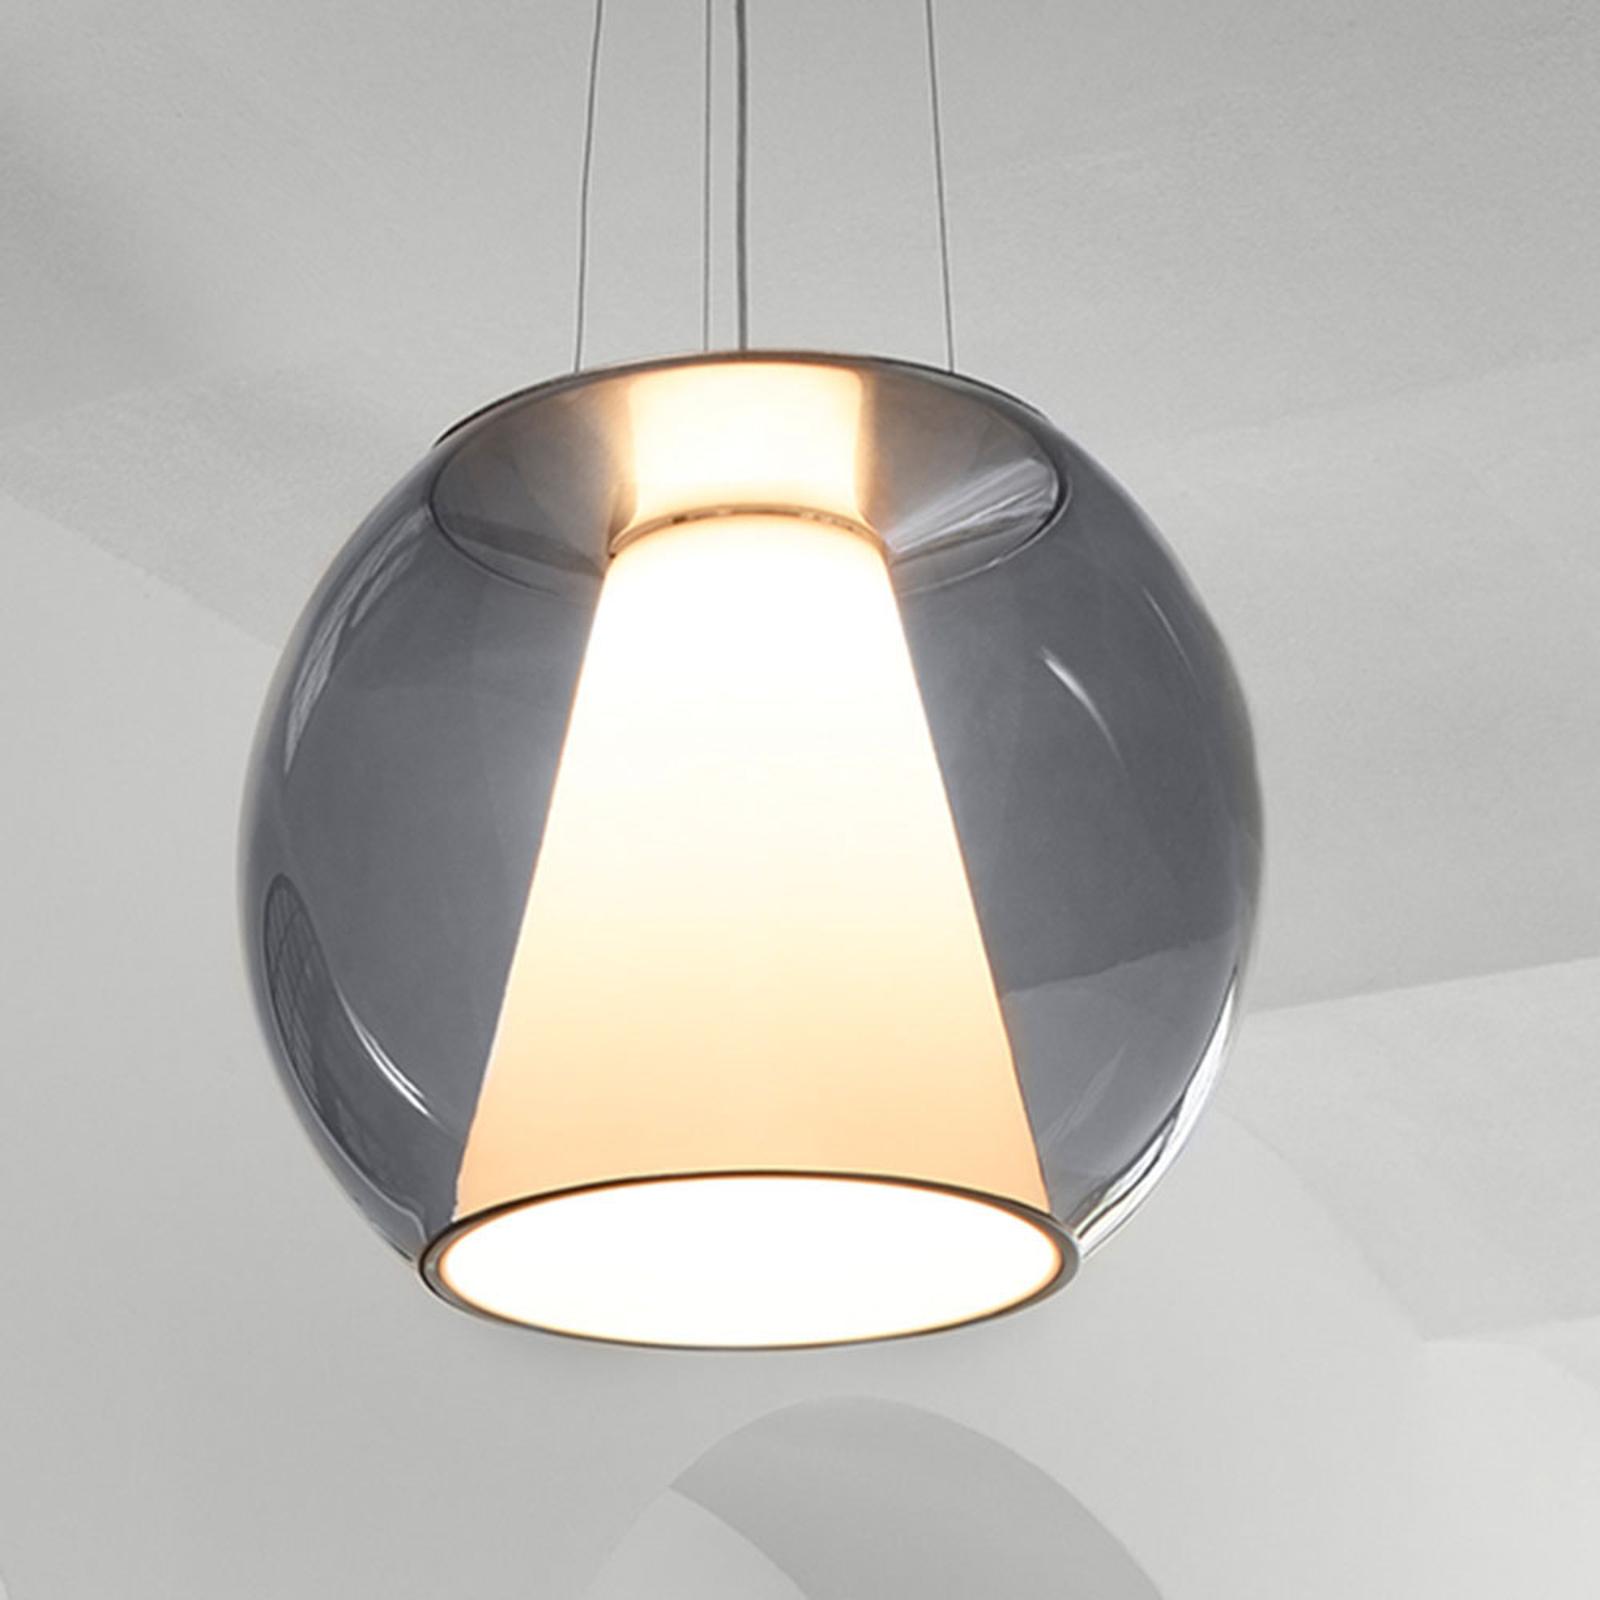 serien.lighting Draft S Hängelampe 927 Triac blau